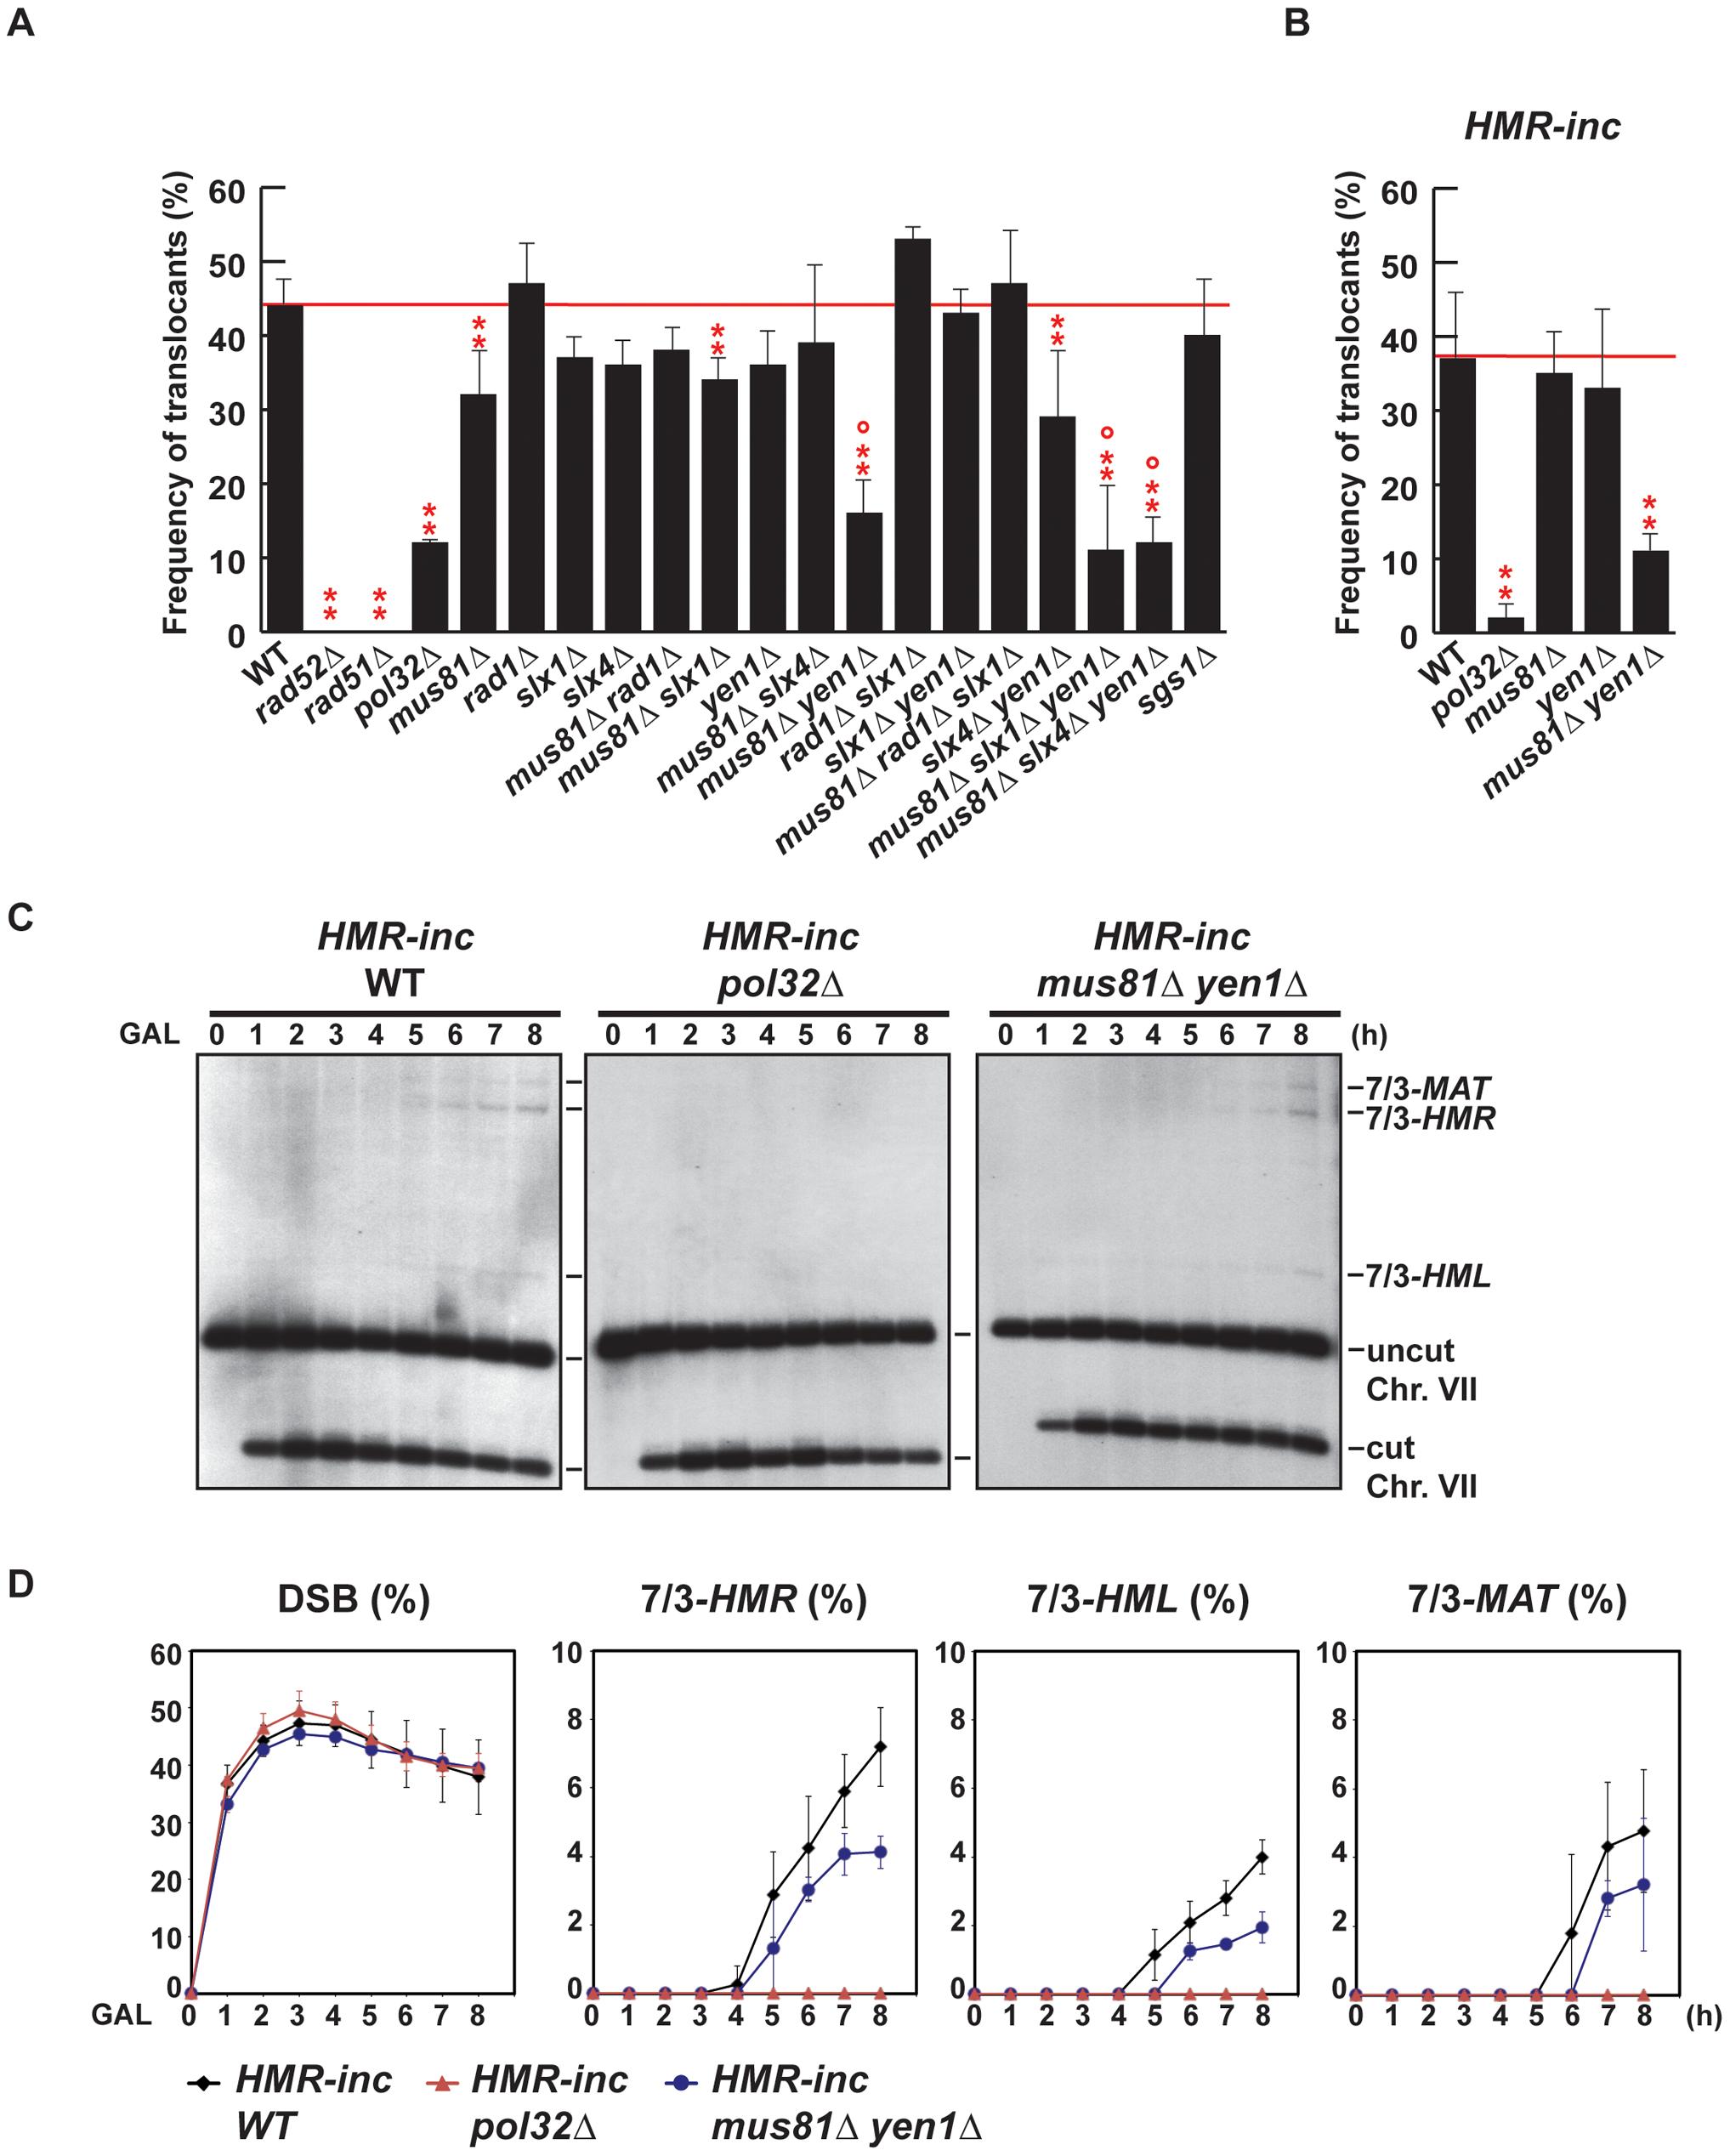 Genetic analysis of BIR intermediates processing in SSE mutants.